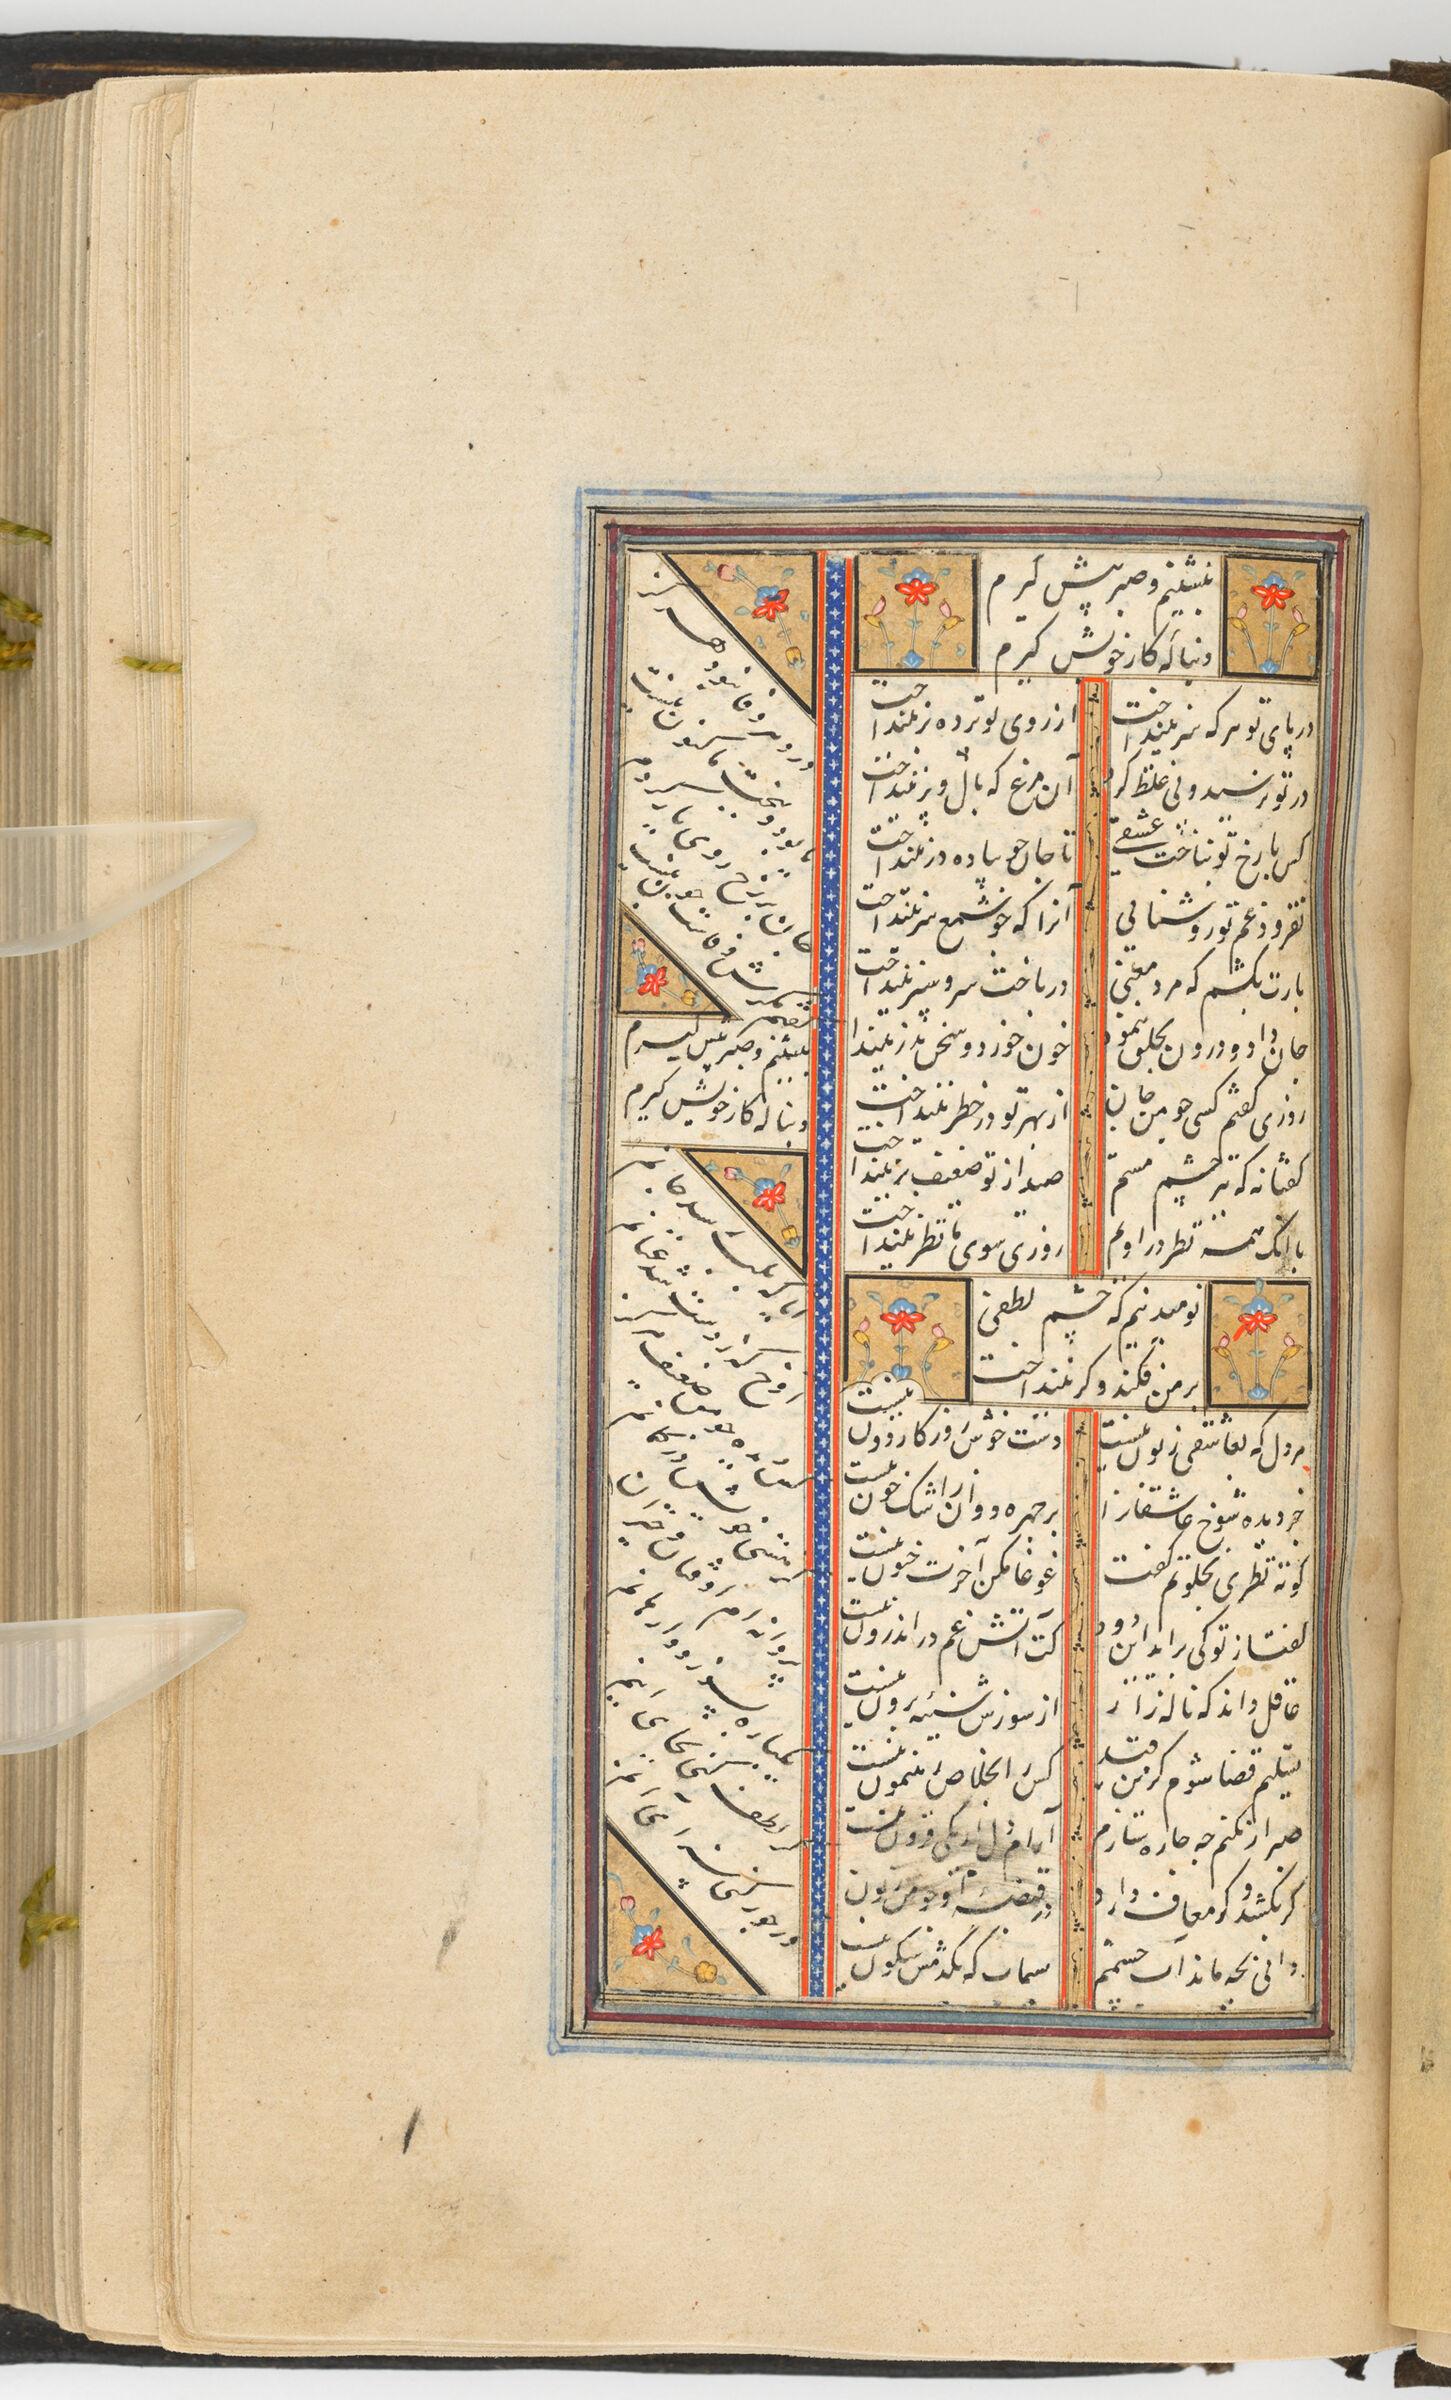 Text Folio (Text Recto; Text Verso Of Folio 187), From A Manuscript Of The Kulliyat Of Sa'di